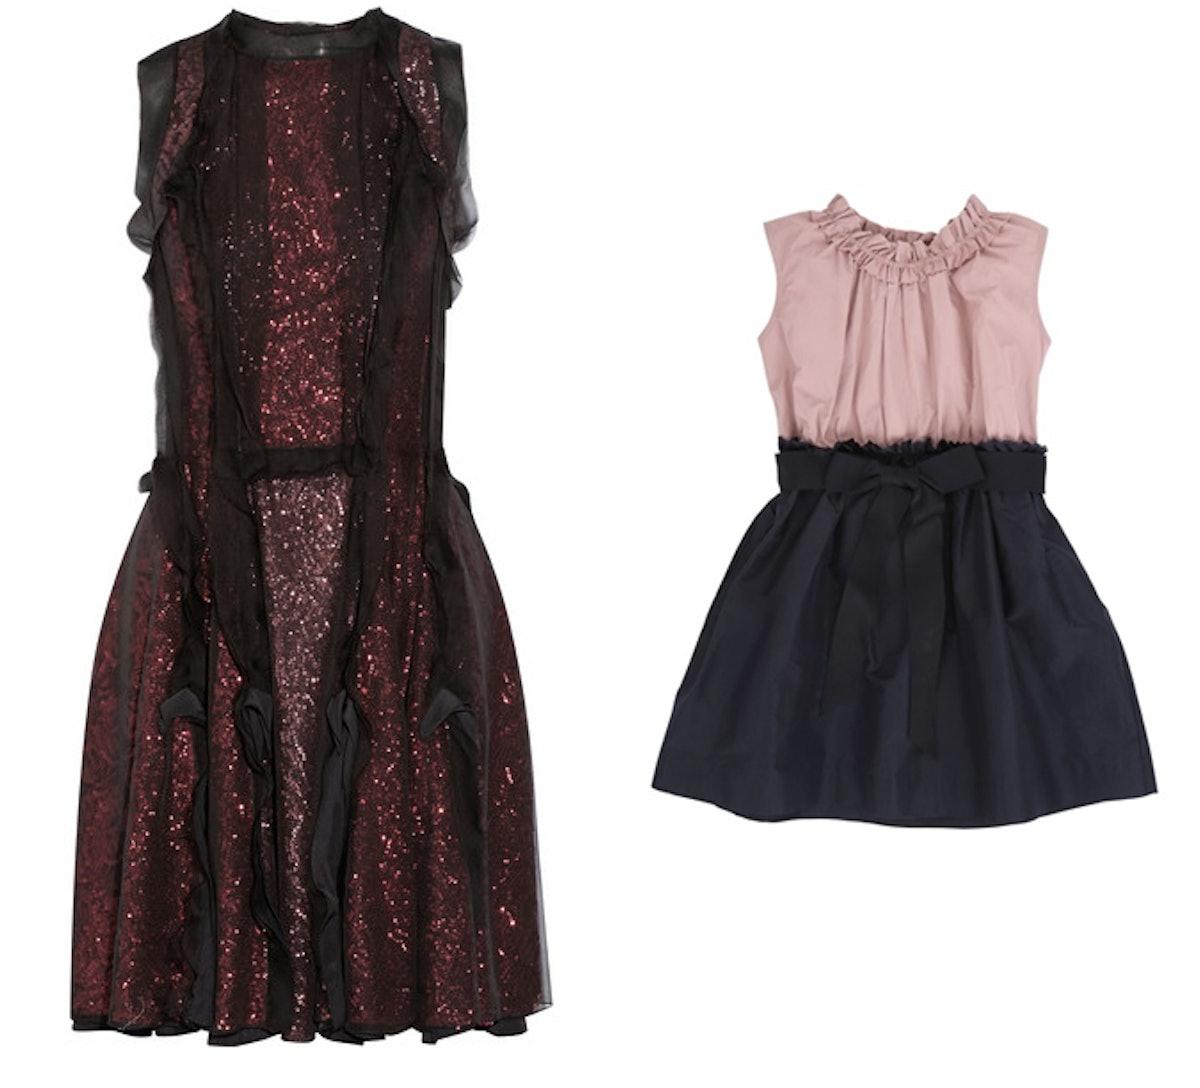 Lanvin sequined chiffon dress